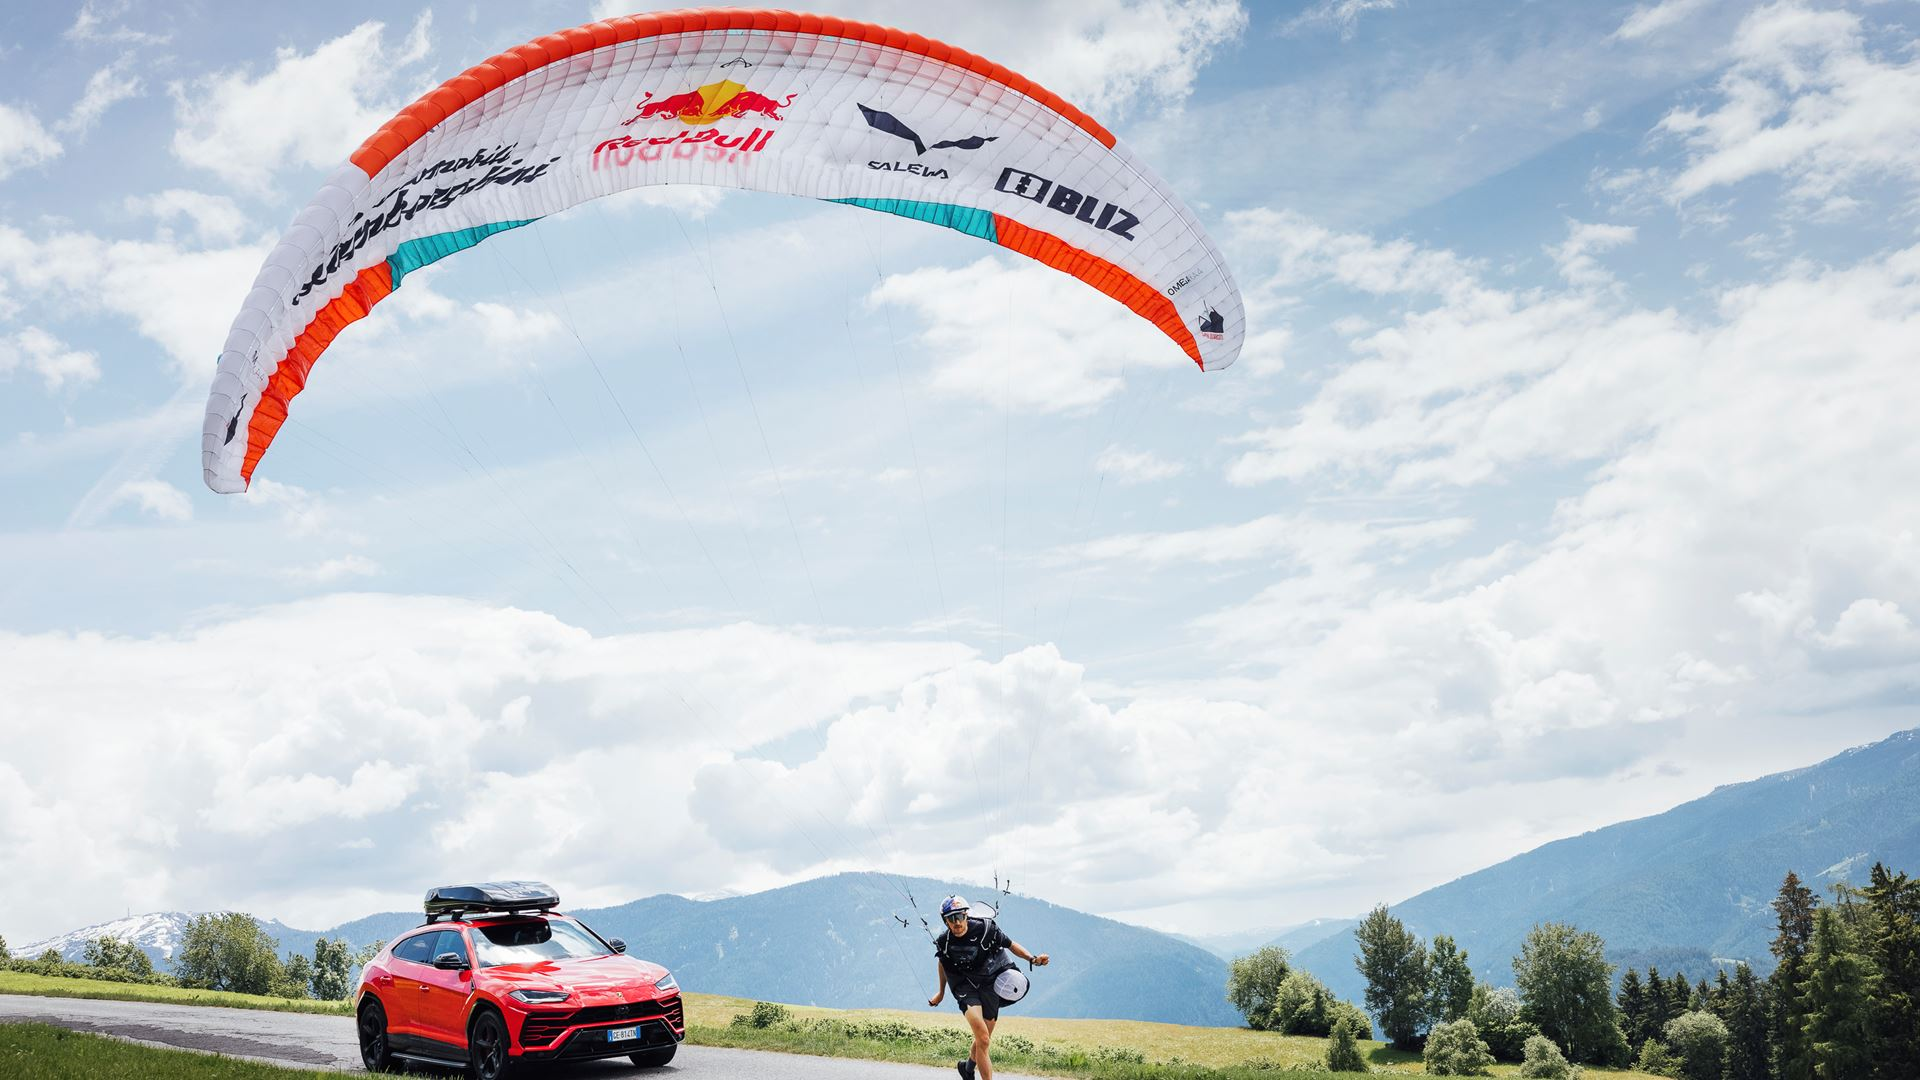 Lamborghini Urus and Aaron Durogati together for an extraordinary feat - Image 4